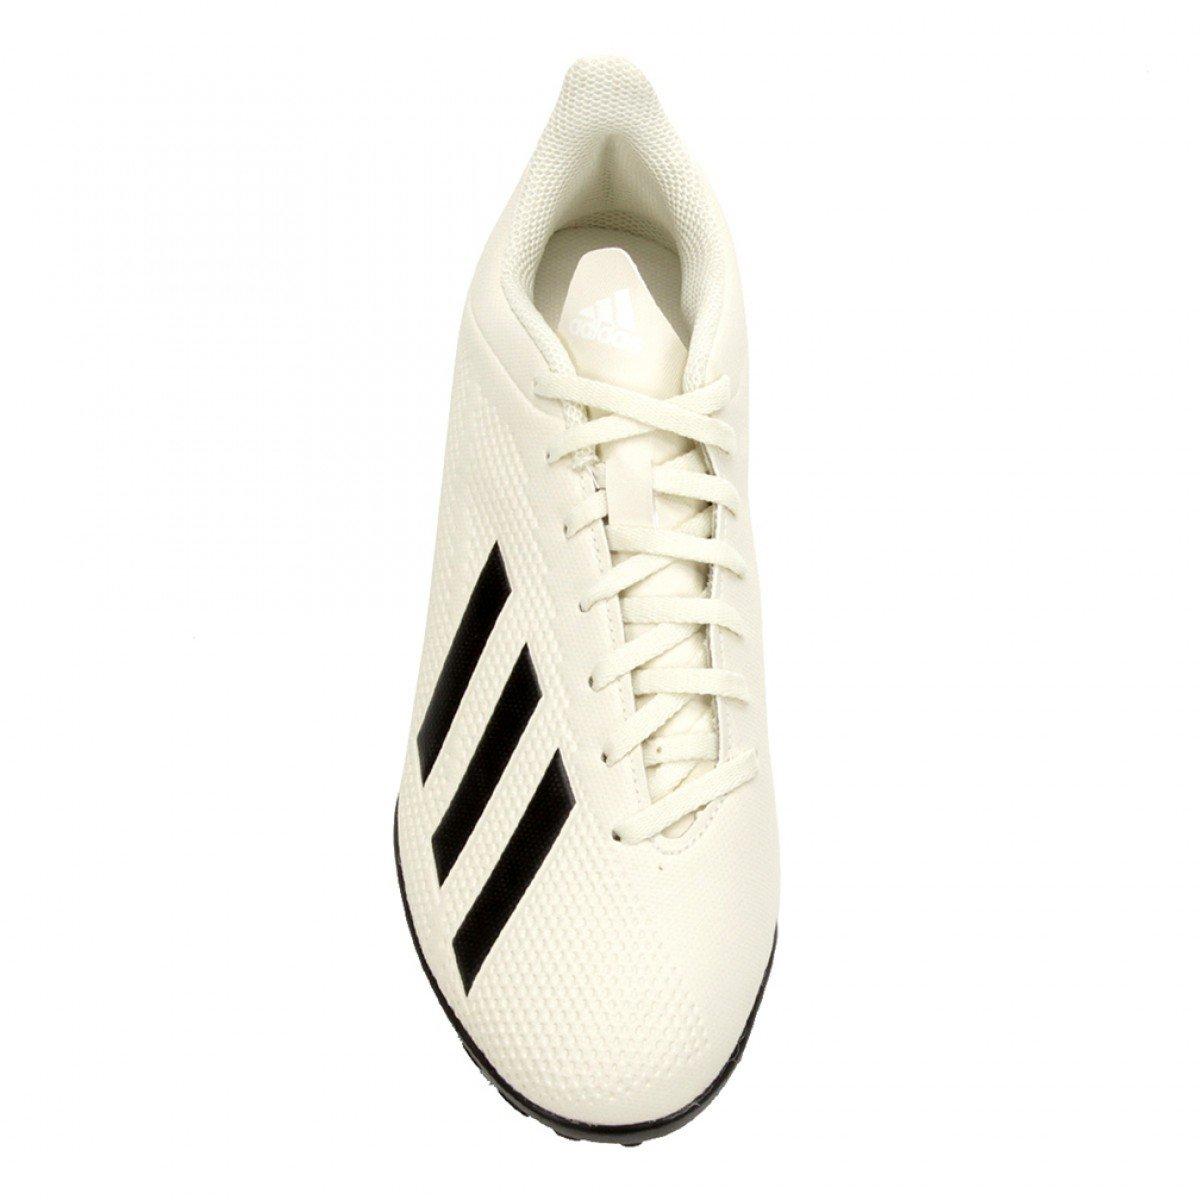 4b9b00184023a ... Chuteira Society Adidas X Tango 18 4 TF Masculina - Branca e Preta ...